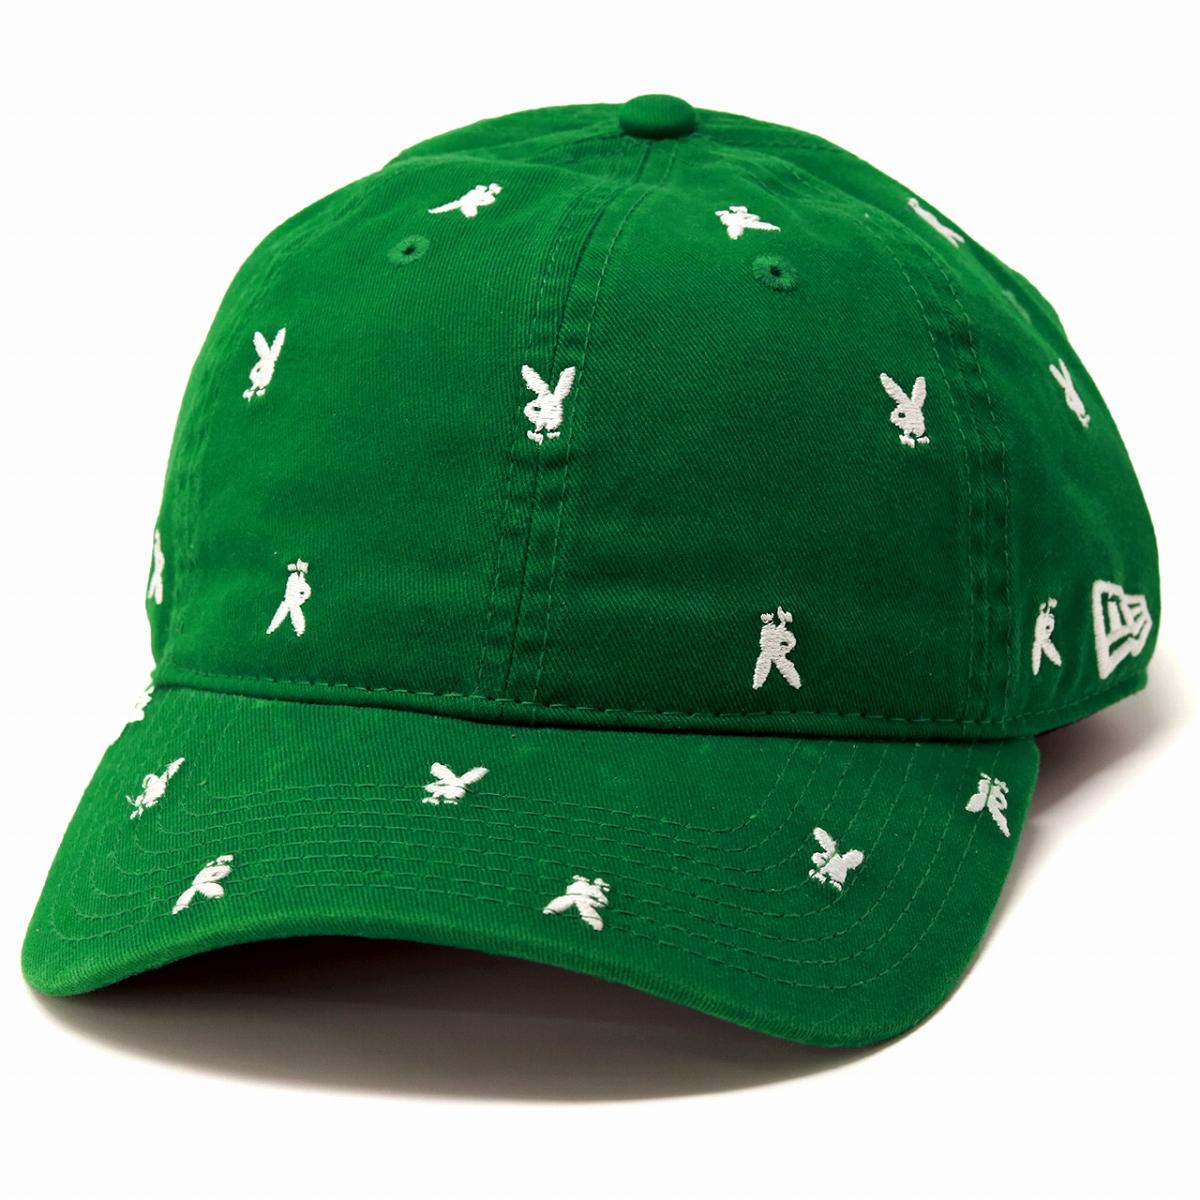 Brand rabbit 9TWENTY adjustable size street Lady s fashion   green Kelly  green  baseball cap  ... 375860c4b21